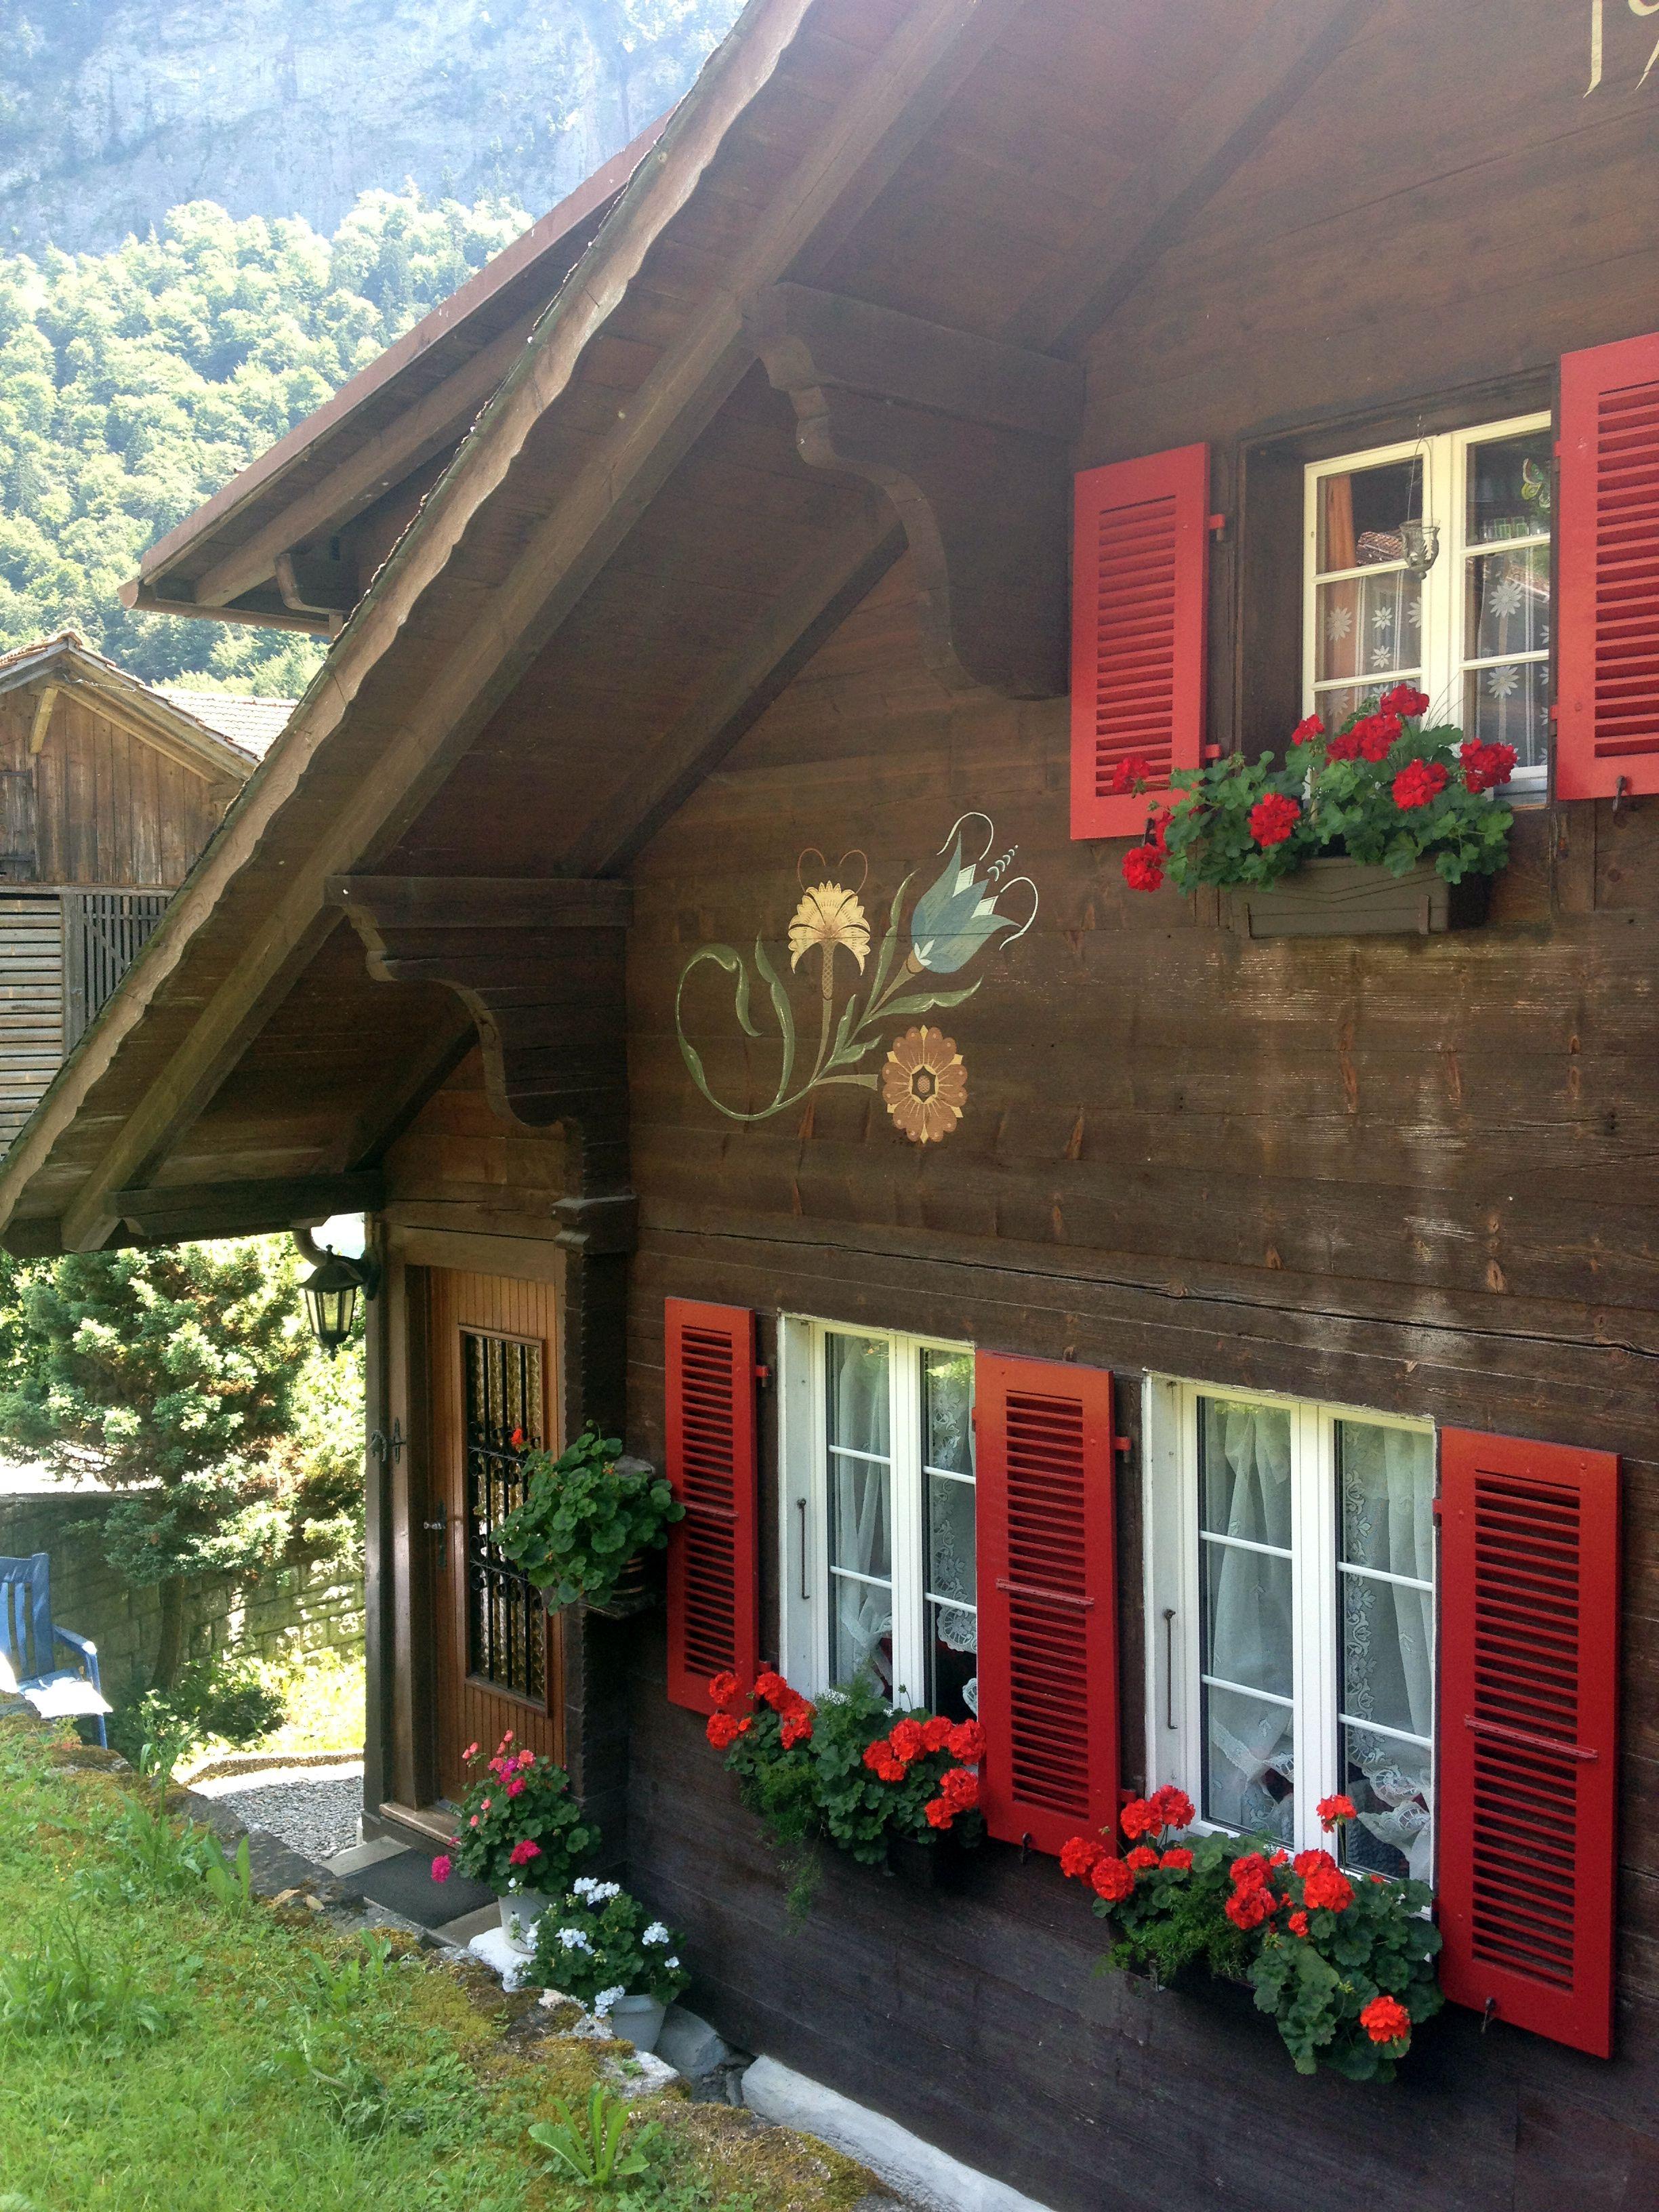 Chalet Between Grindelwald And Zweilutshinen Switzerland With